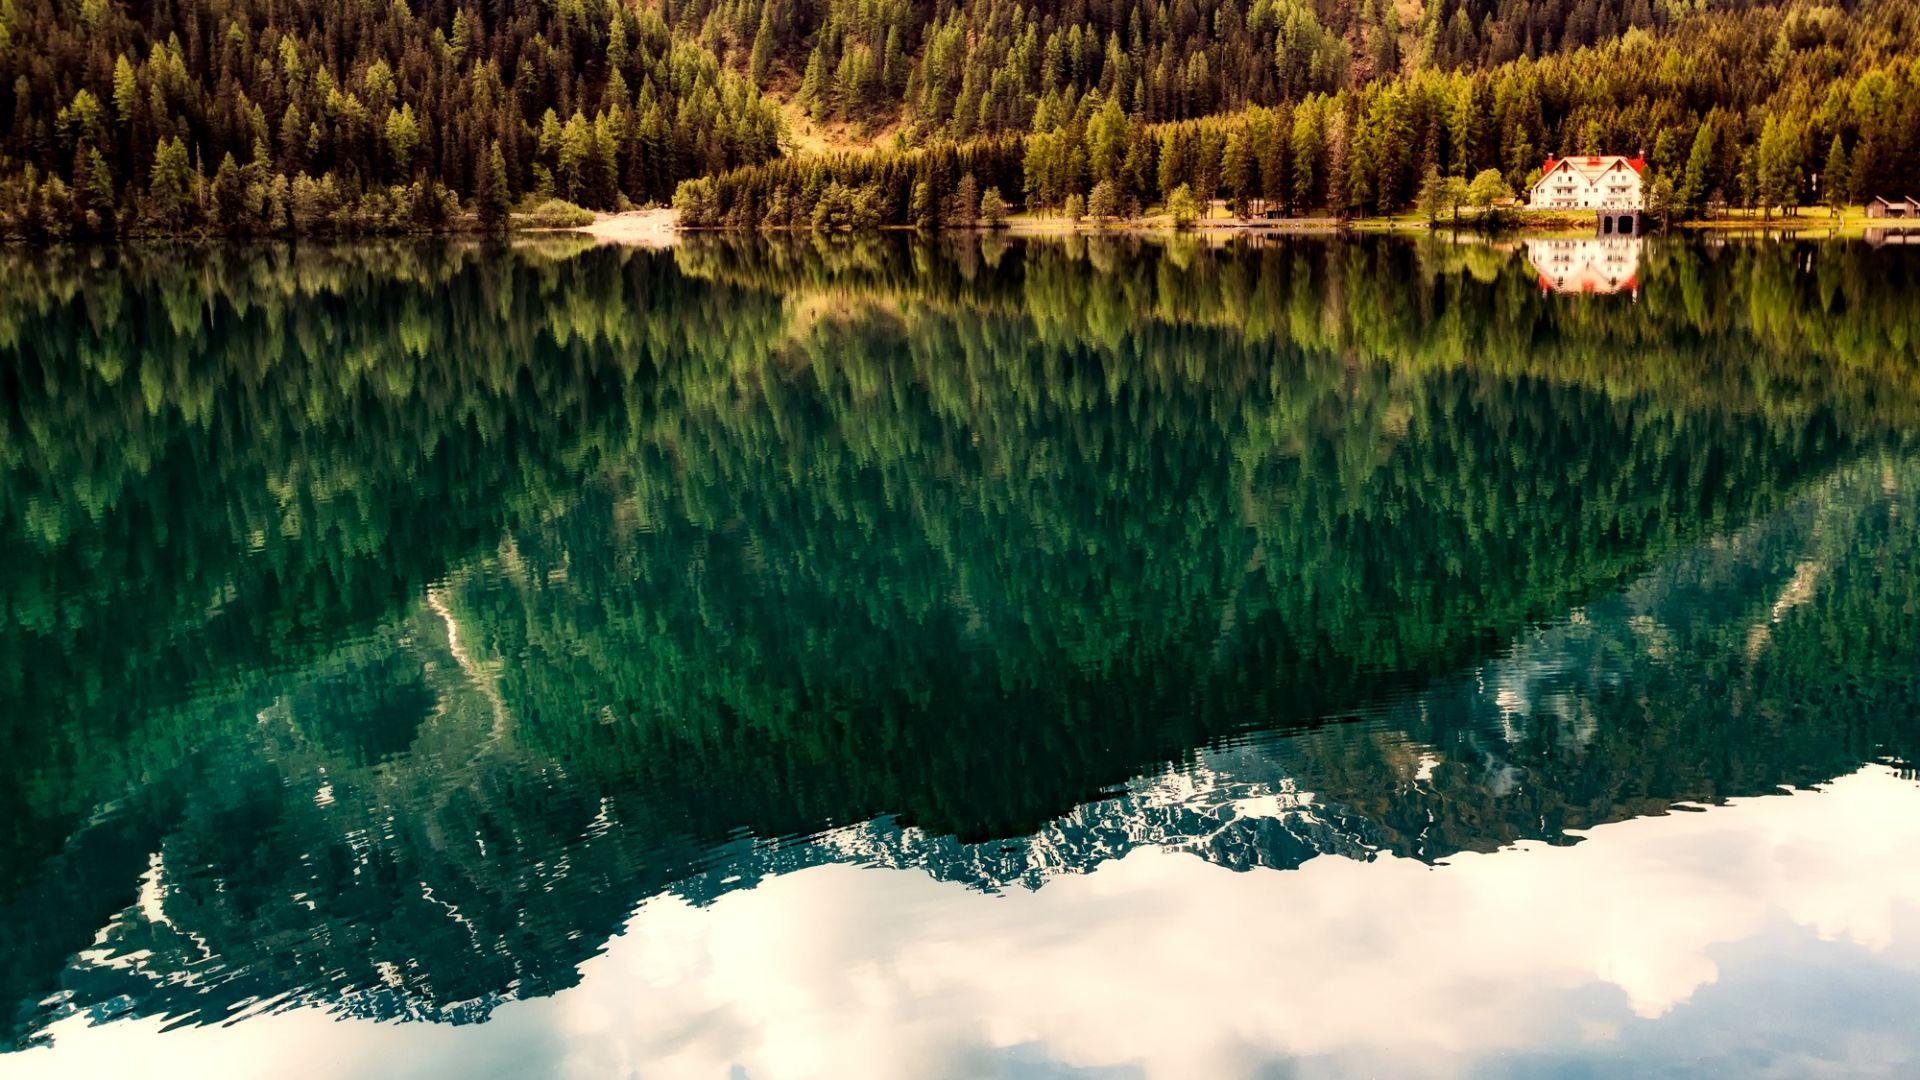 Wallpaper Lake, tree, reflections, nature